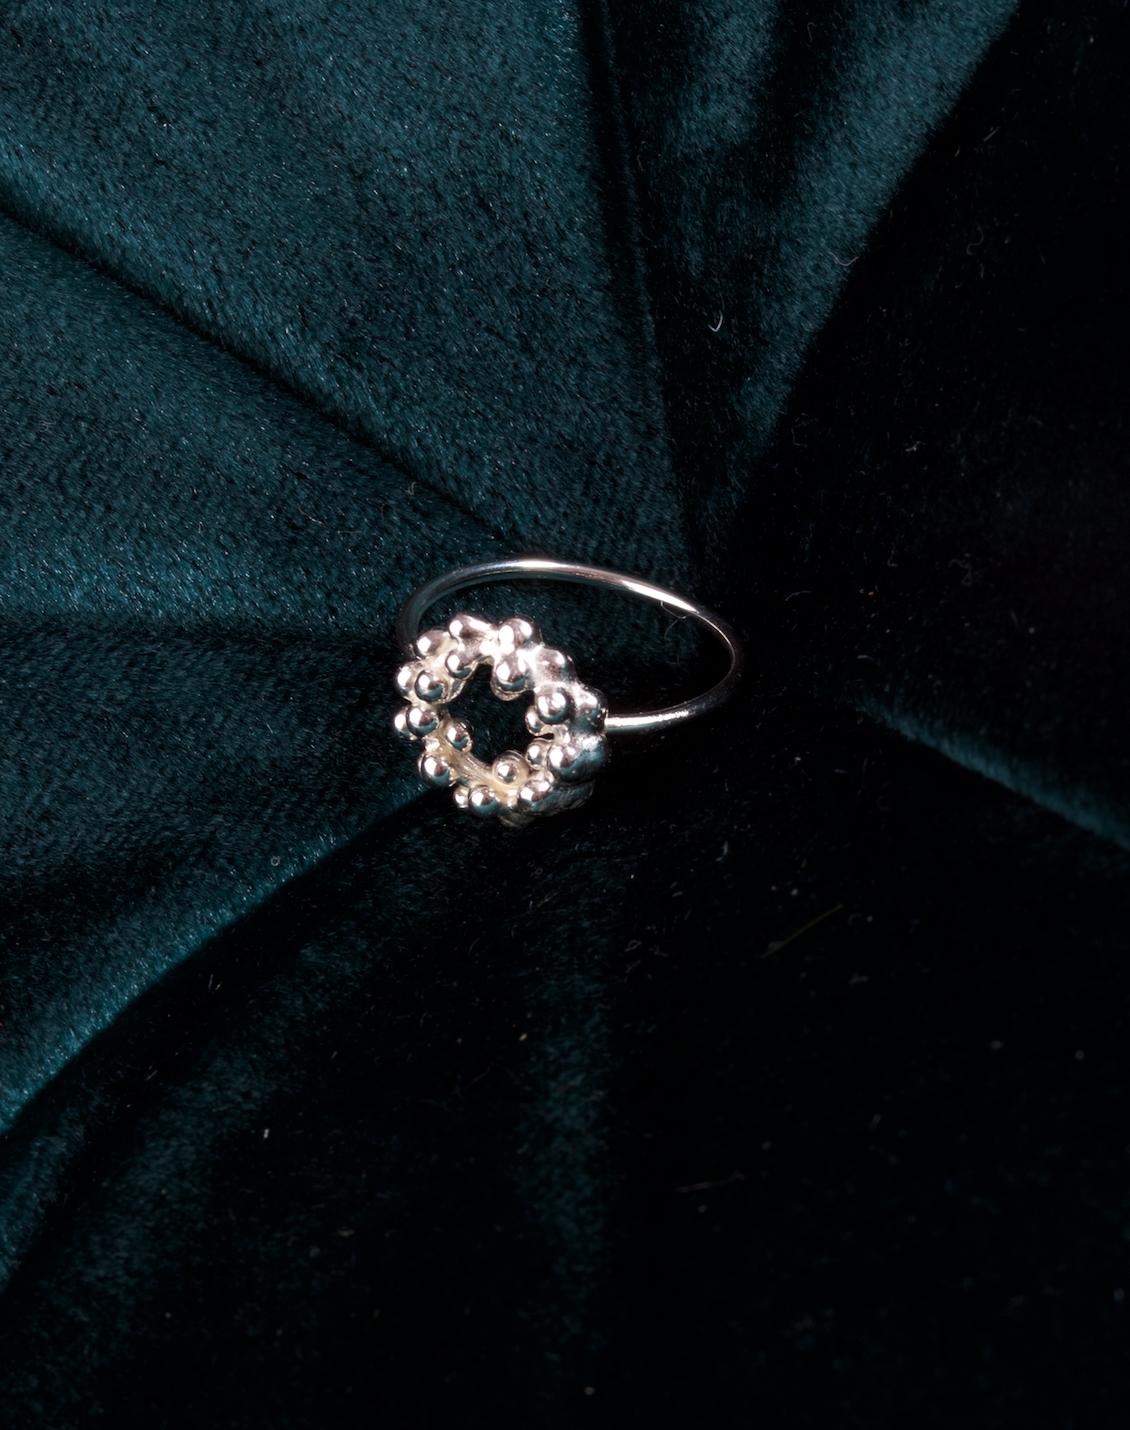 ada-hodgson-silver-gold-contemporary-australian-jewellery-designer-jeweller-design-handmade-mebourne-custom-engagement-wedding-enamel-sterling-jewelry-statement-ring-earrings--bespoke